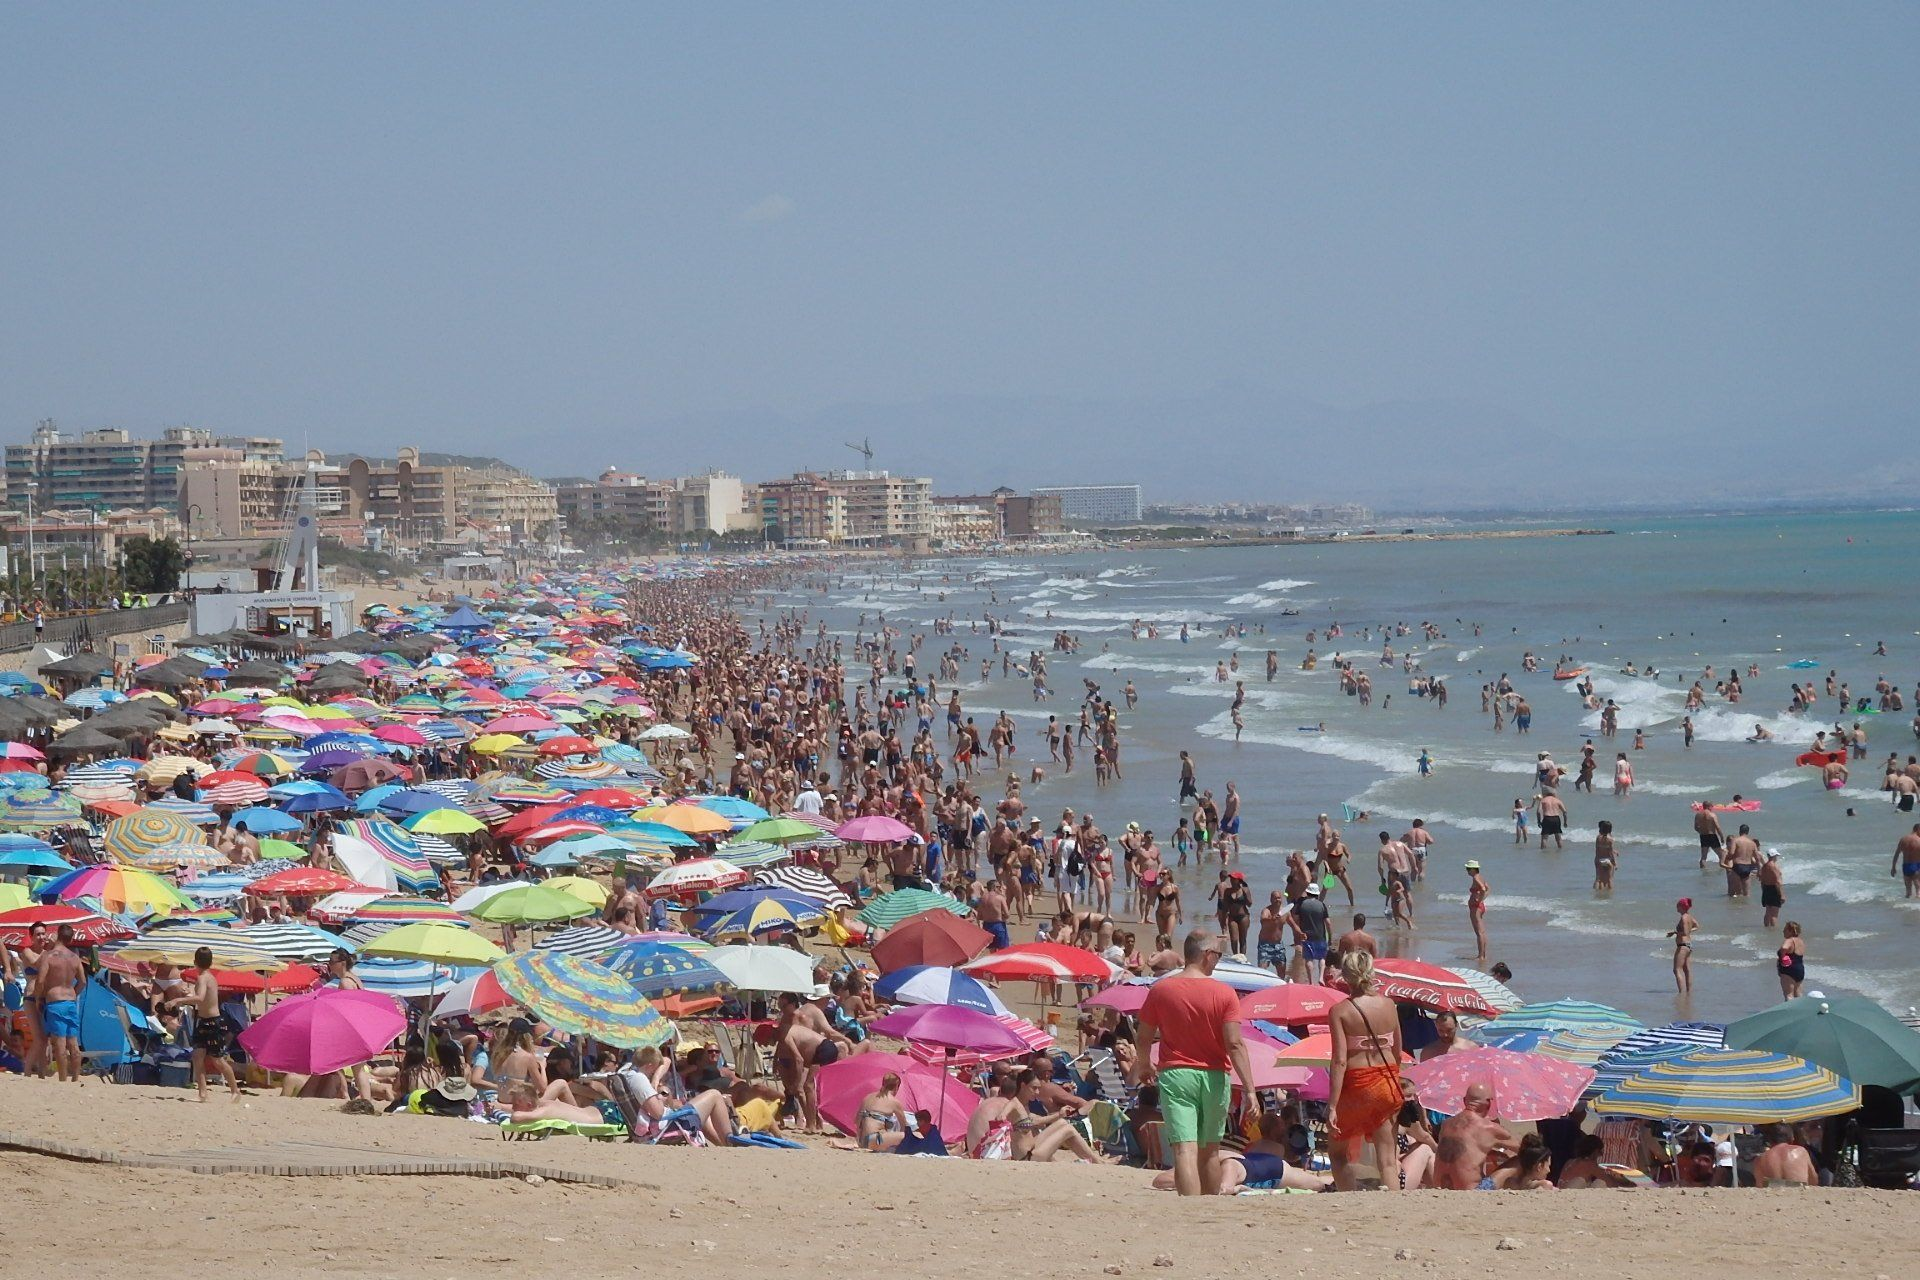 La Mata Beach Torrevieja Spain Top Tips Before You Go Tripadvisor Trip Advisor Spain Travel Travel Photos